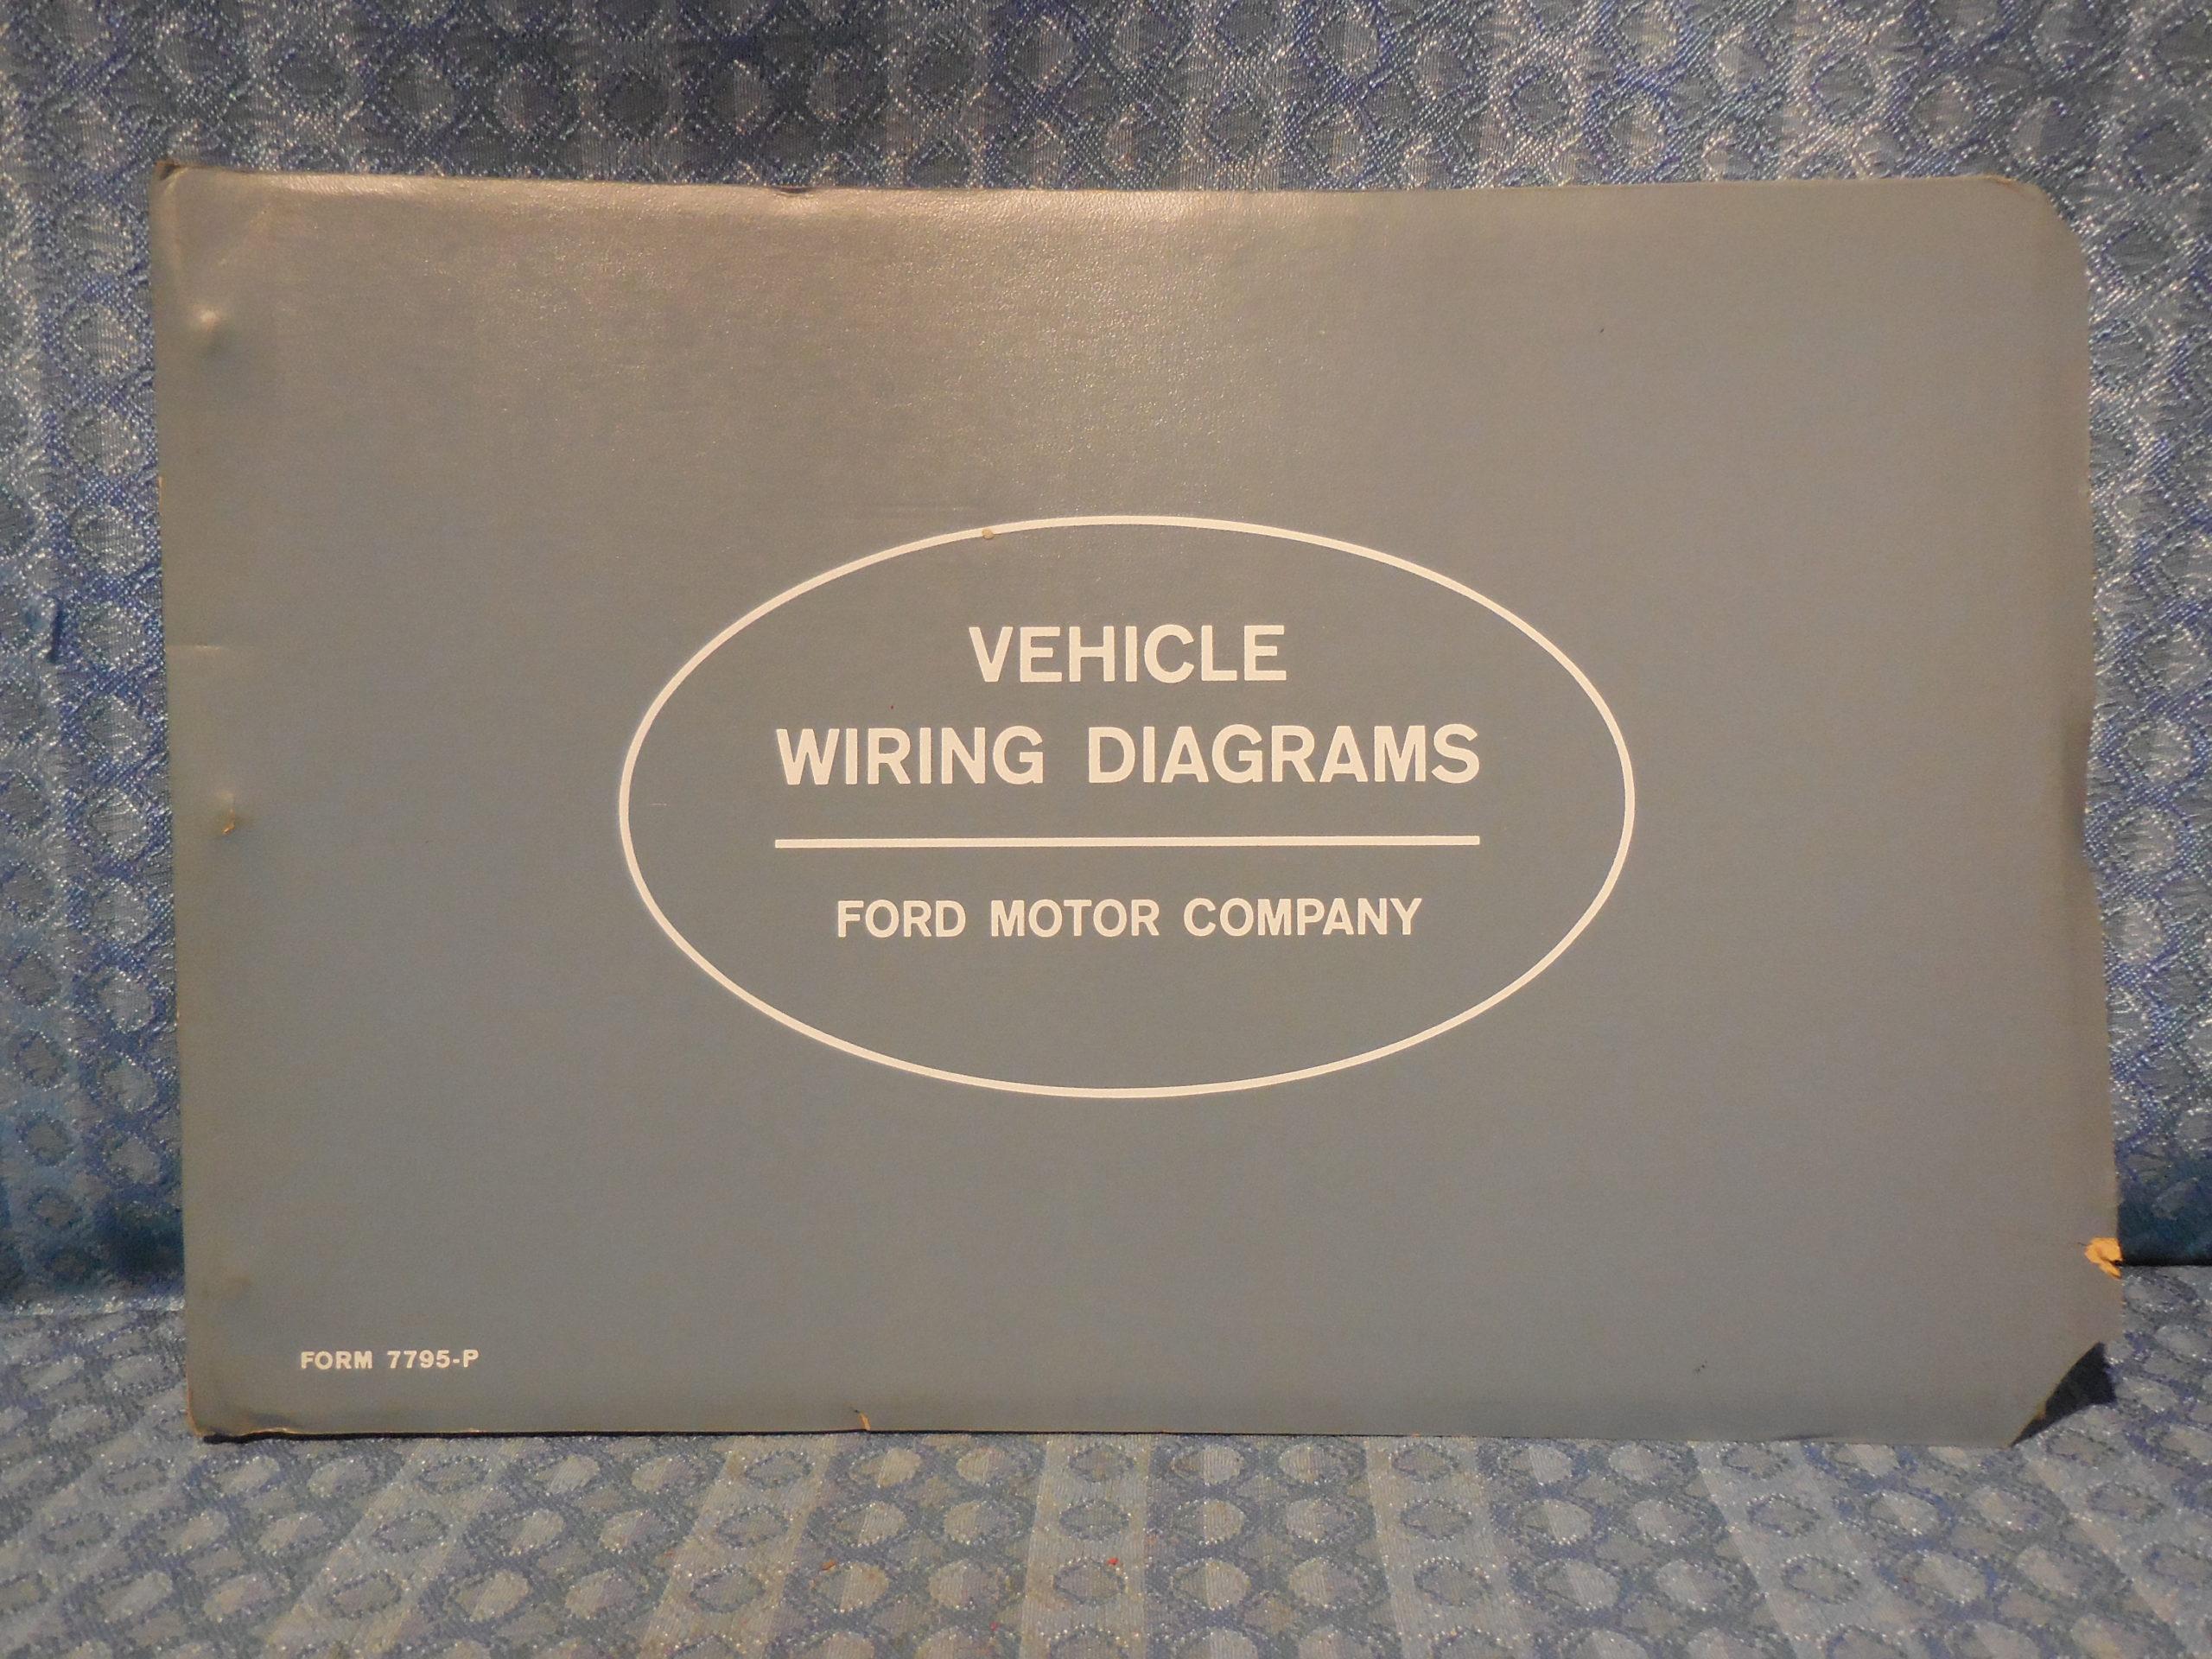 1963 Ford Lincoln Mercury Truck Original OEM Wiring Diagrams Manual  Continental – NOS Texas Parts [ 1920 x 2560 Pixel ]